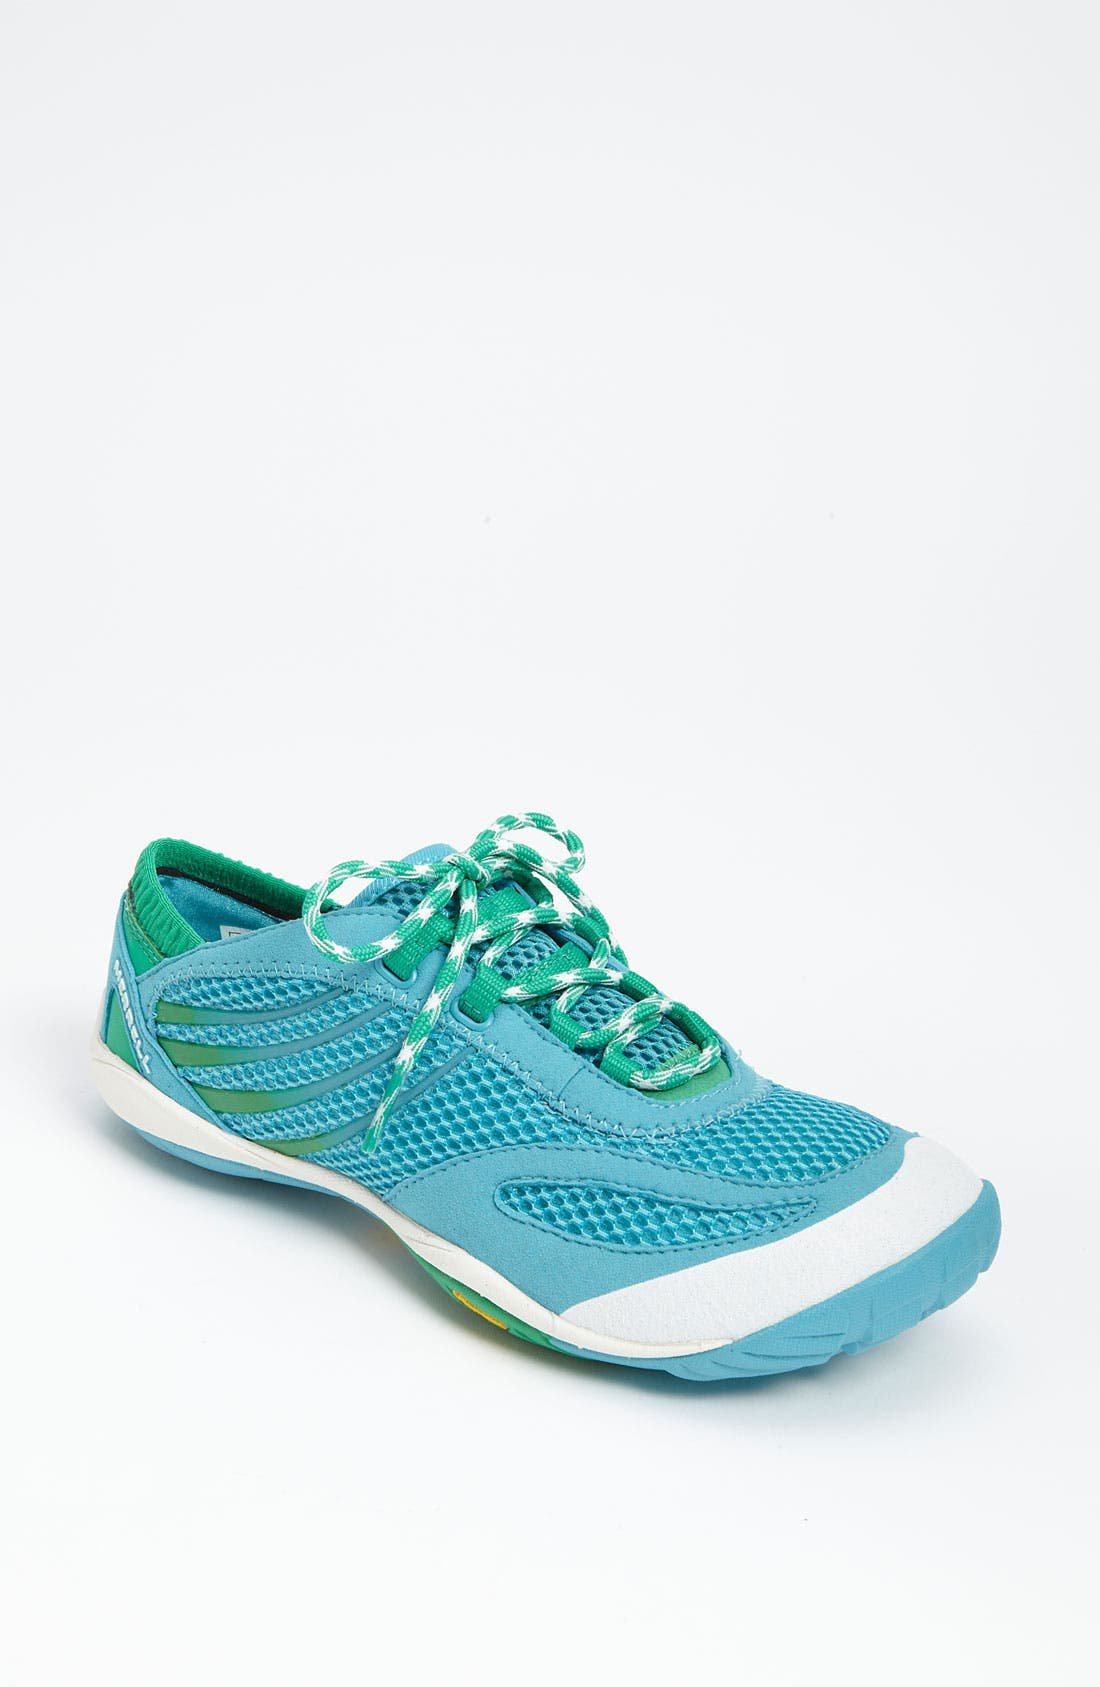 Alternate Image 1 Selected - Merrell 'Pace Glove' Running Shoe (Women)